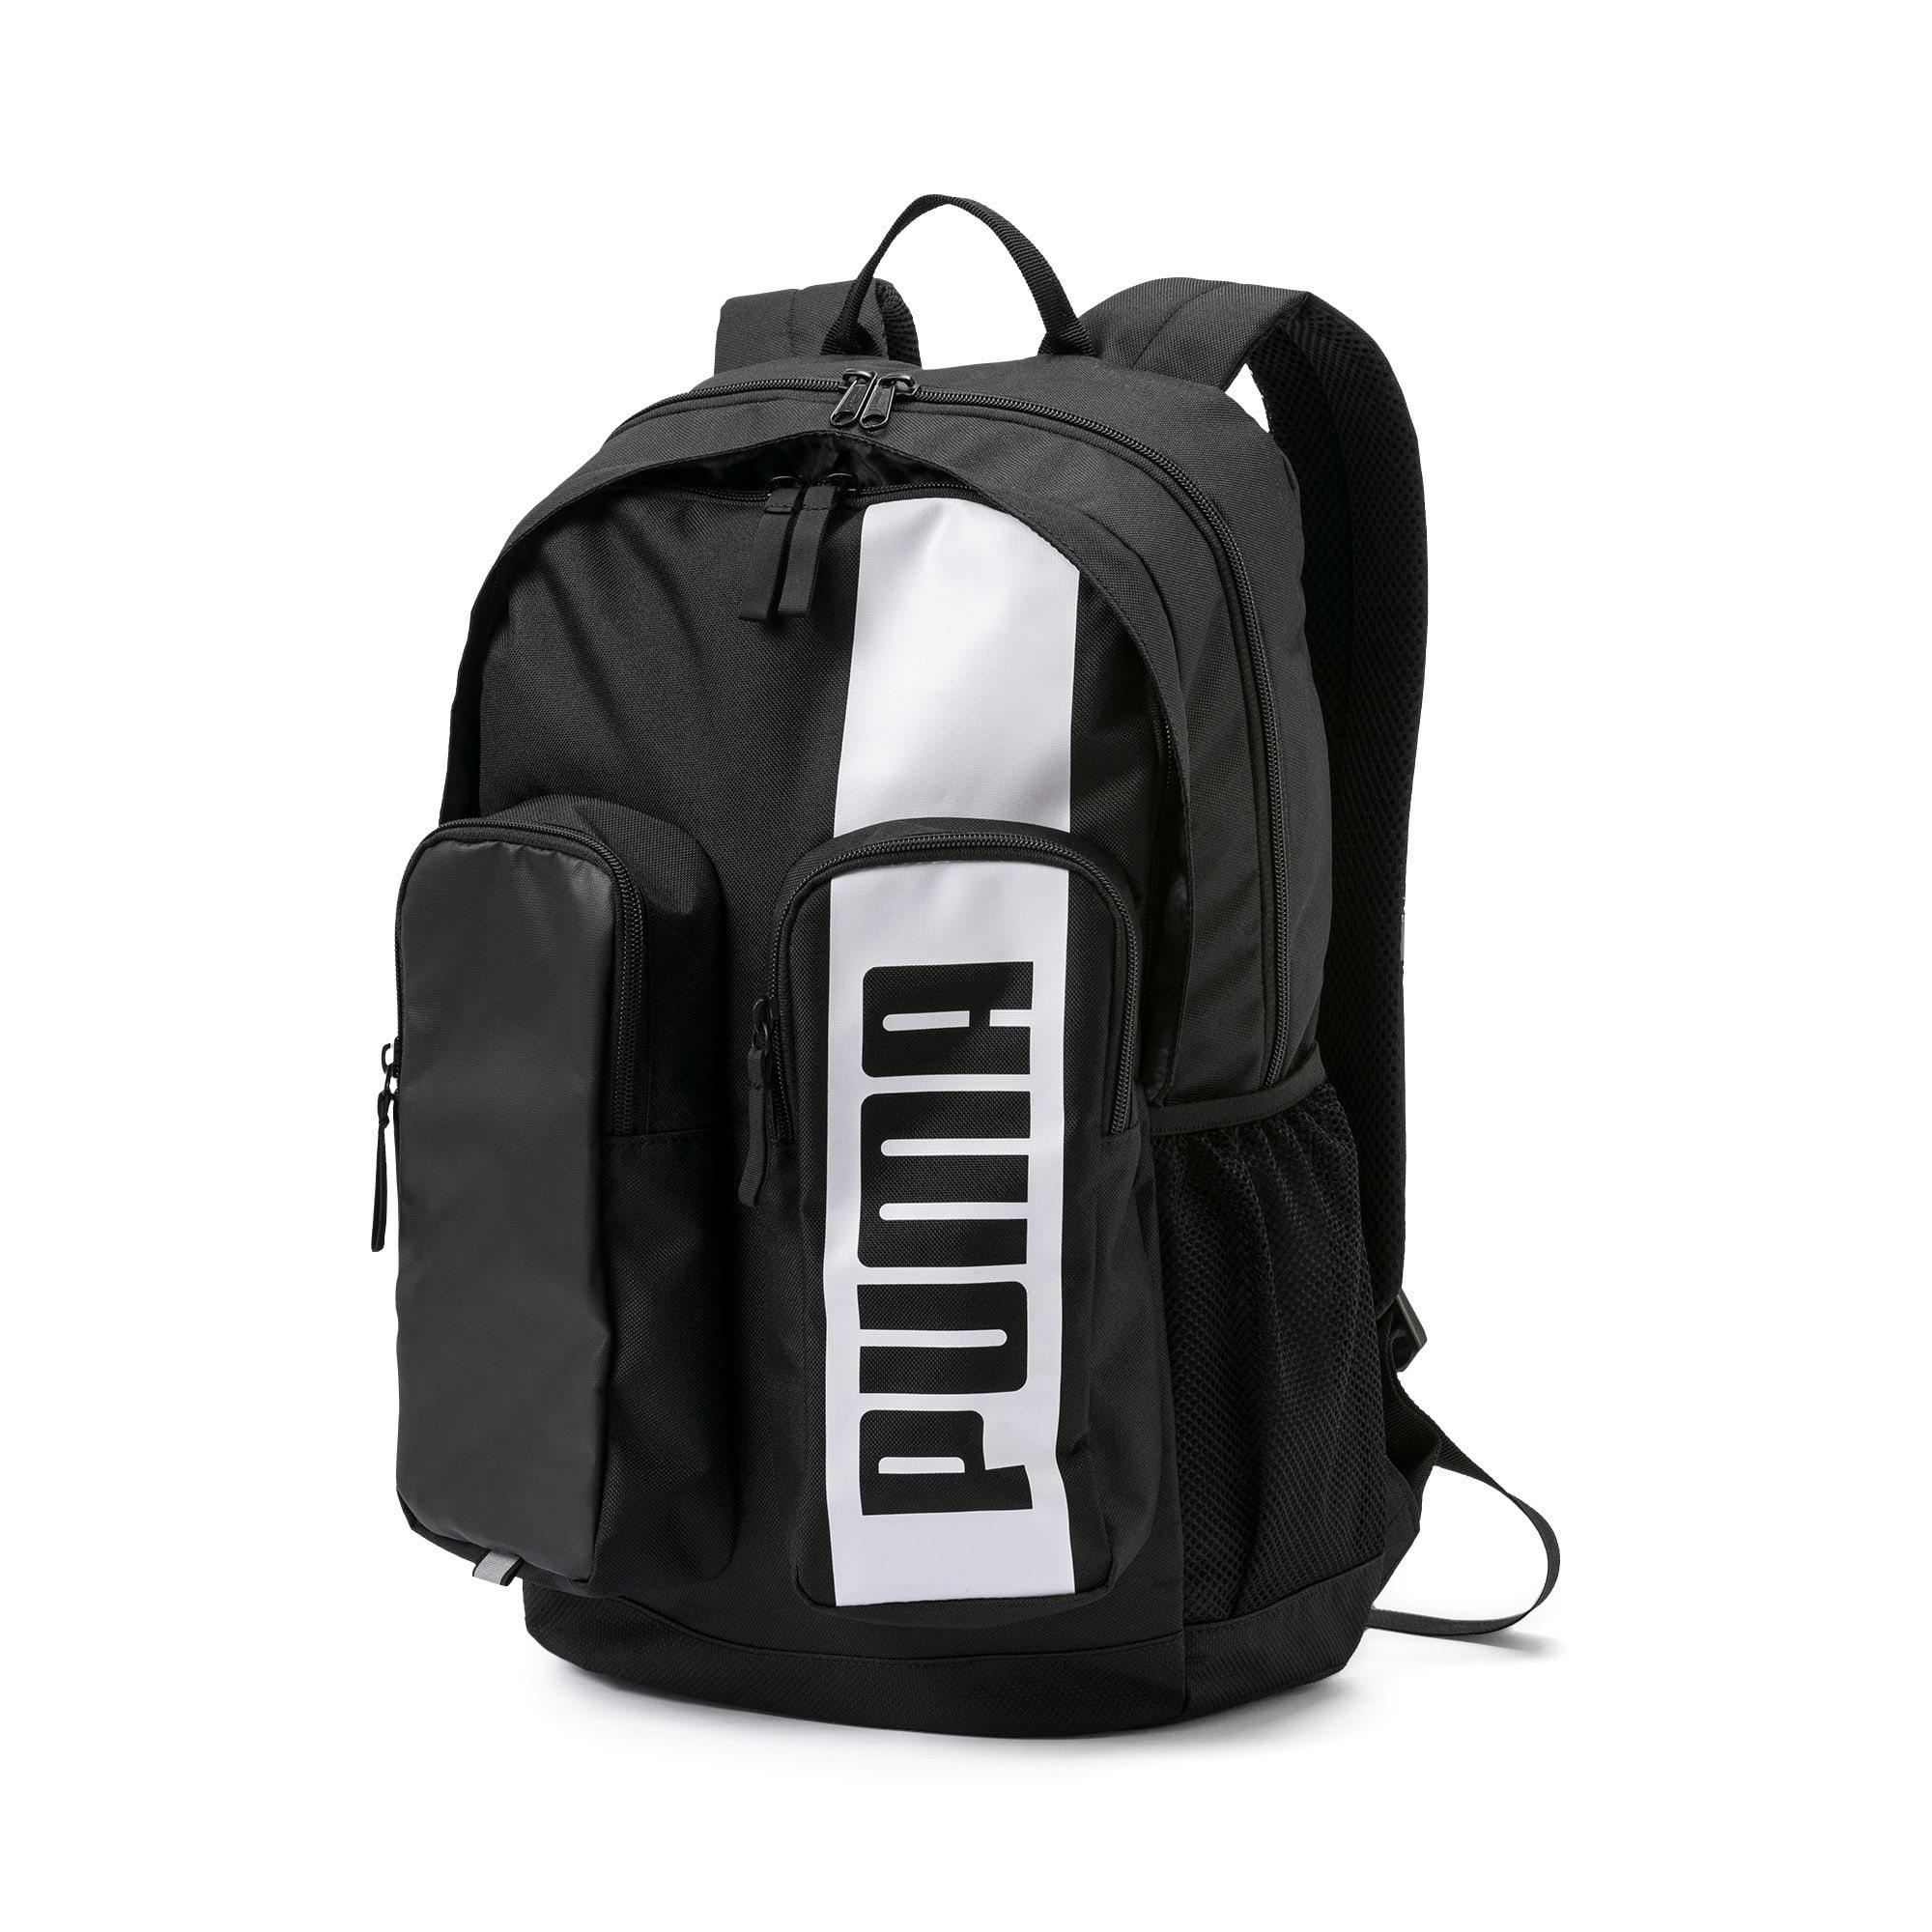 Thumbnail 1 of Deck Backpack II, Puma Black, medium